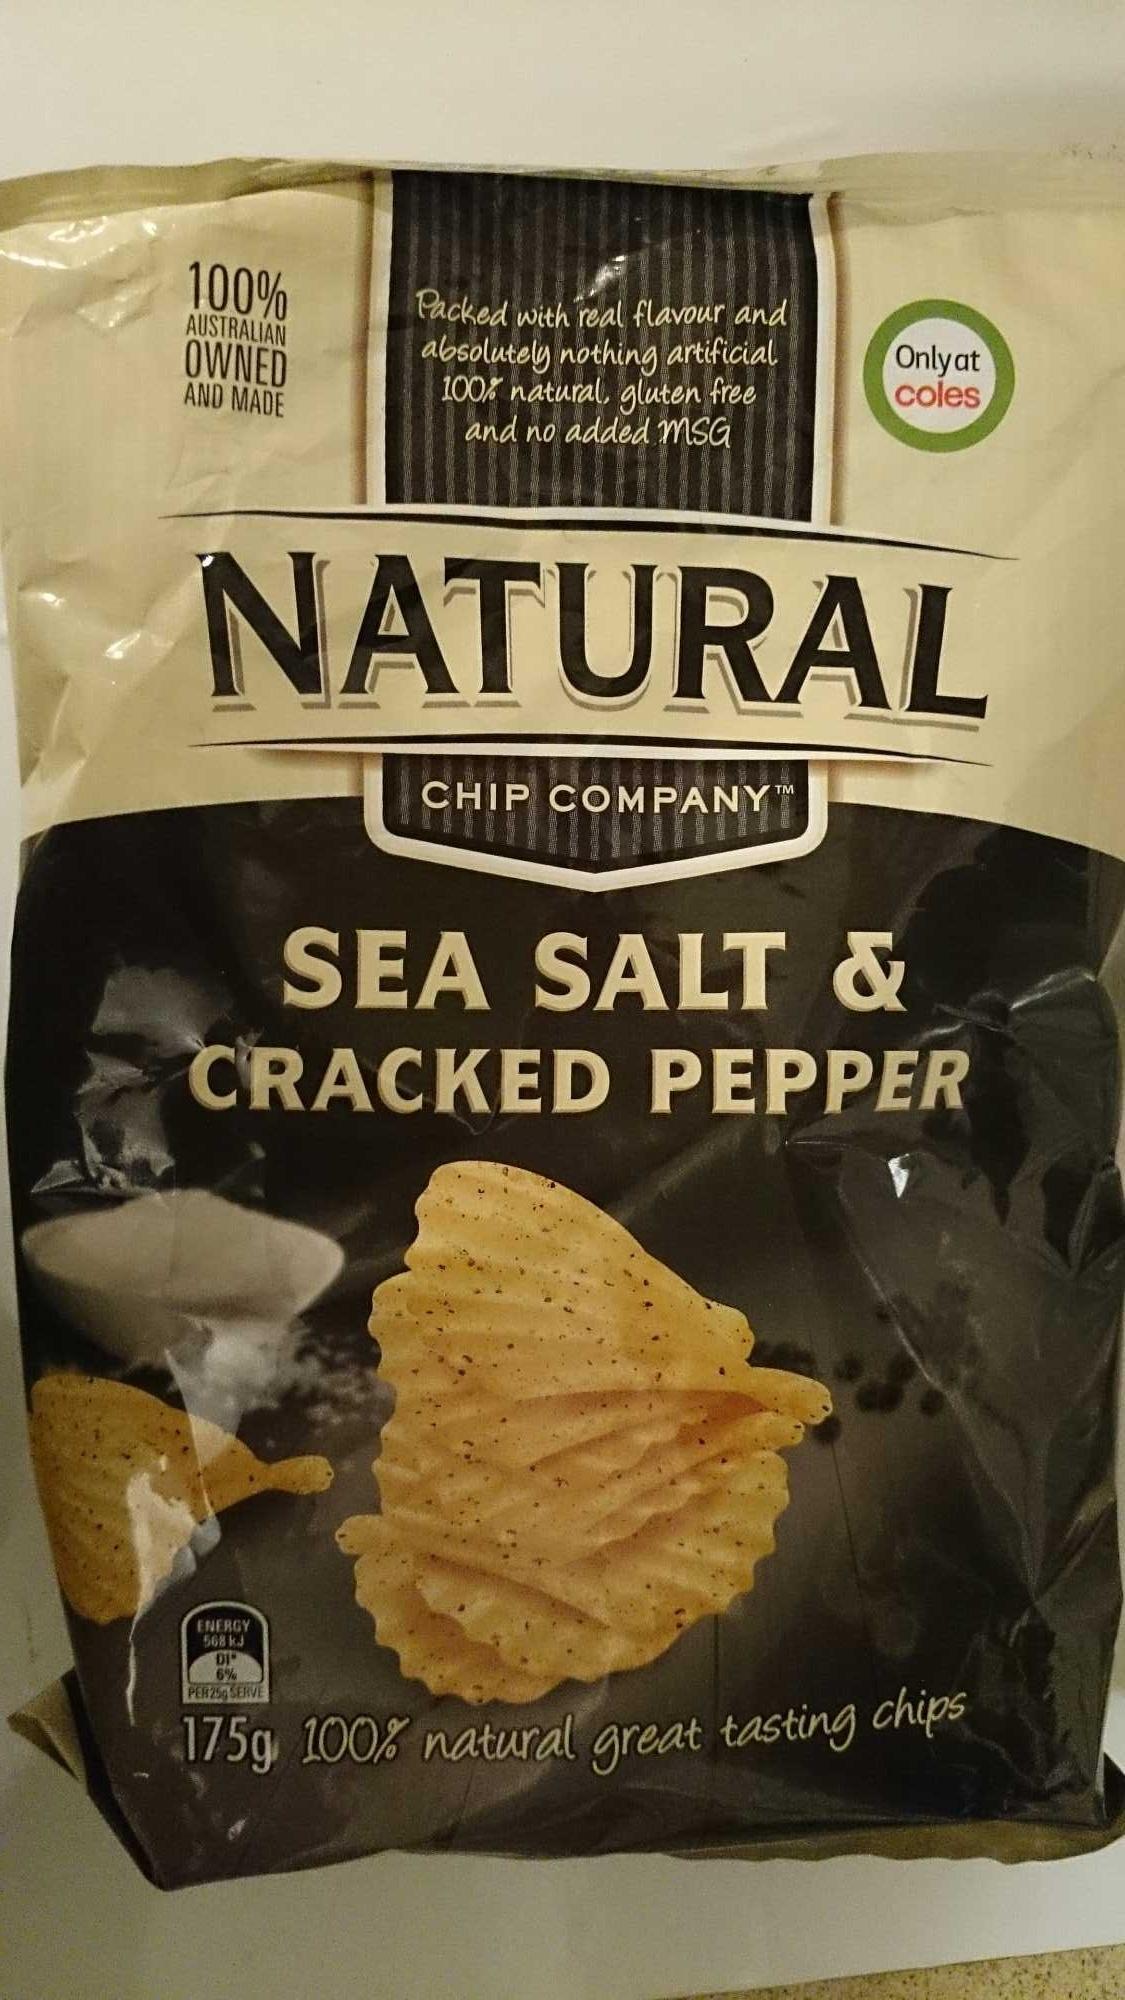 Natural Chip Company Sea Salt & Cracked Pepper - Product - en